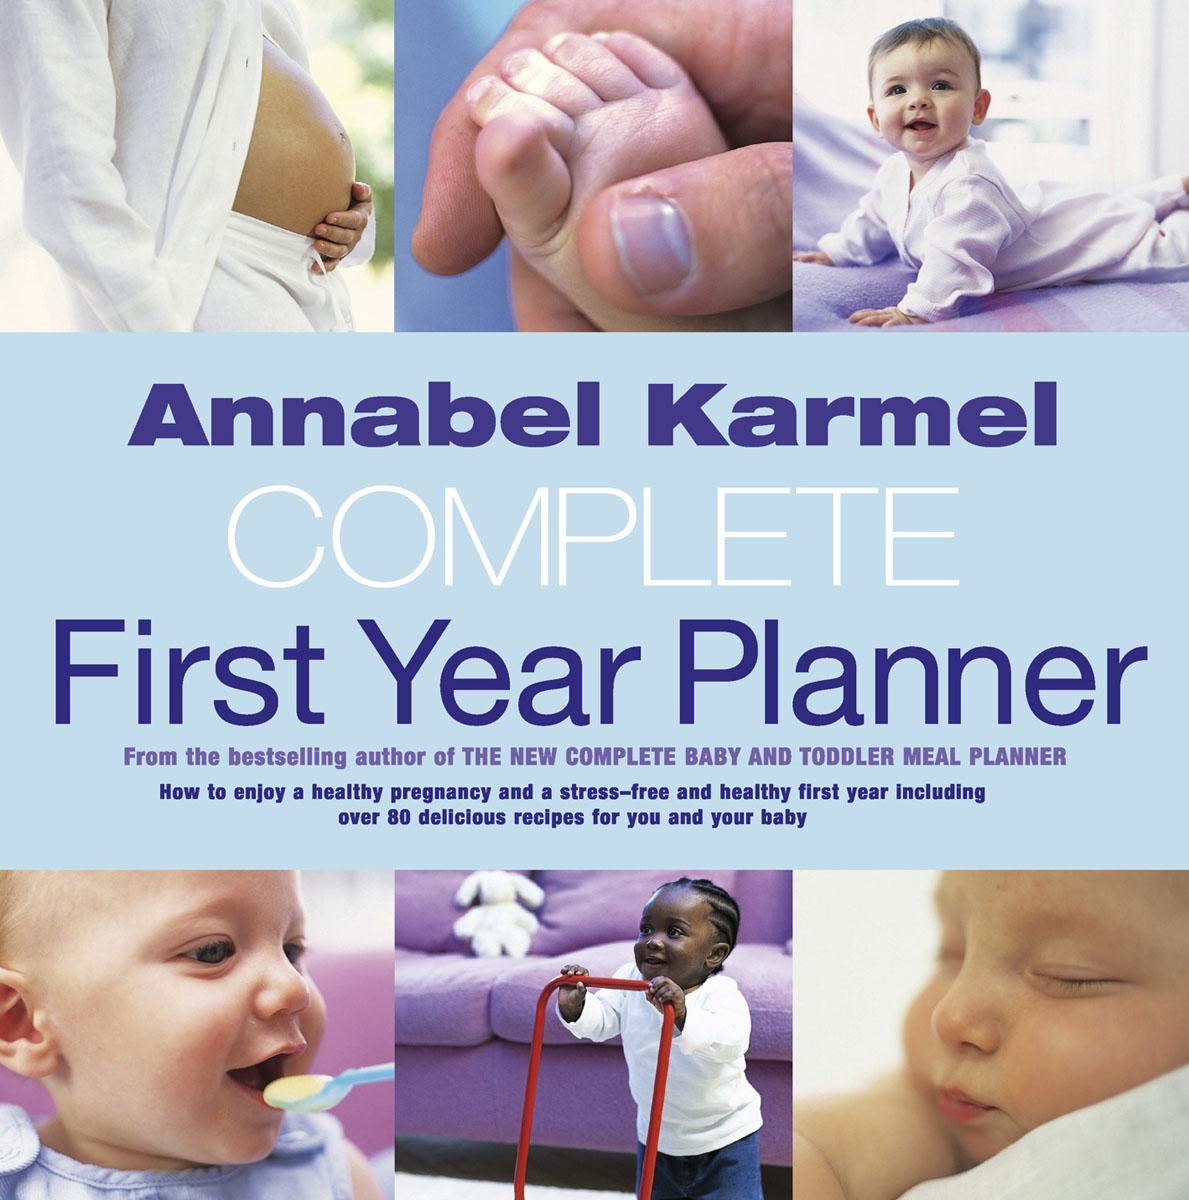 Annabel Karmel's Complete First Year Planner